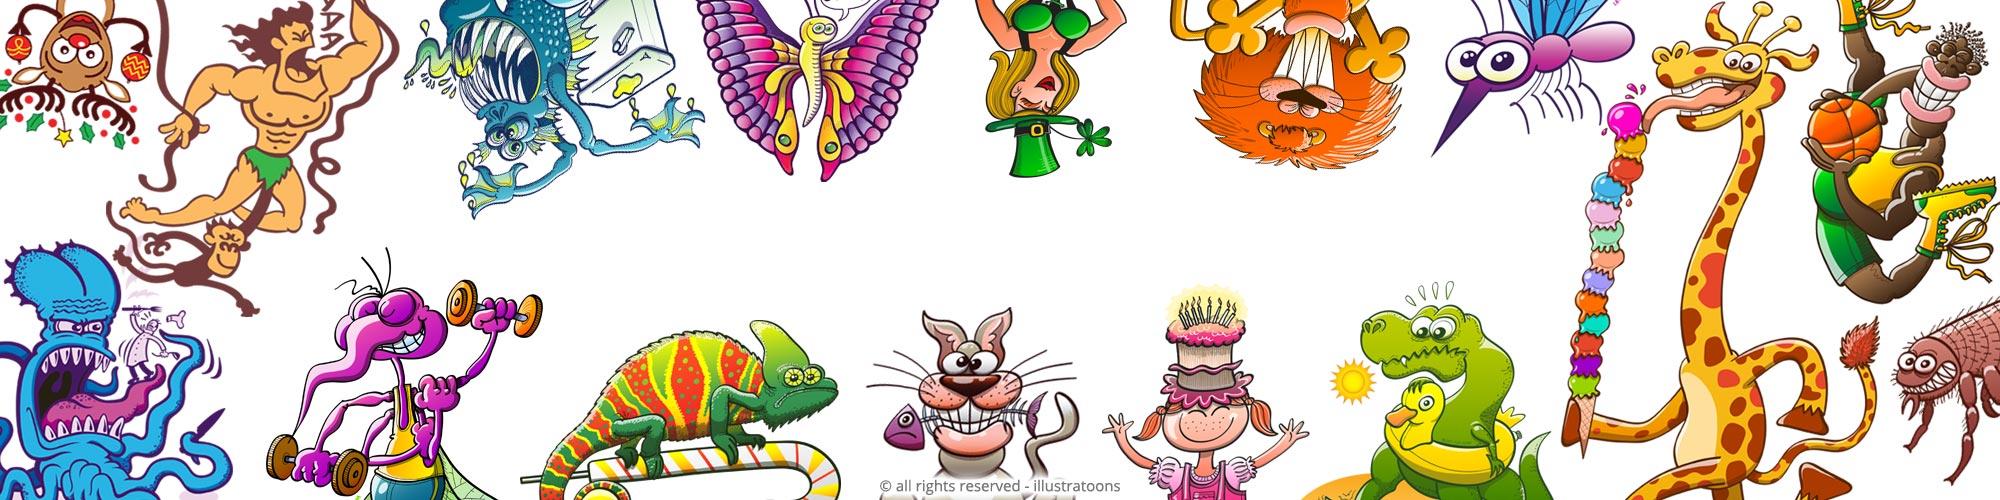 illustratoons-Image-Gallery1